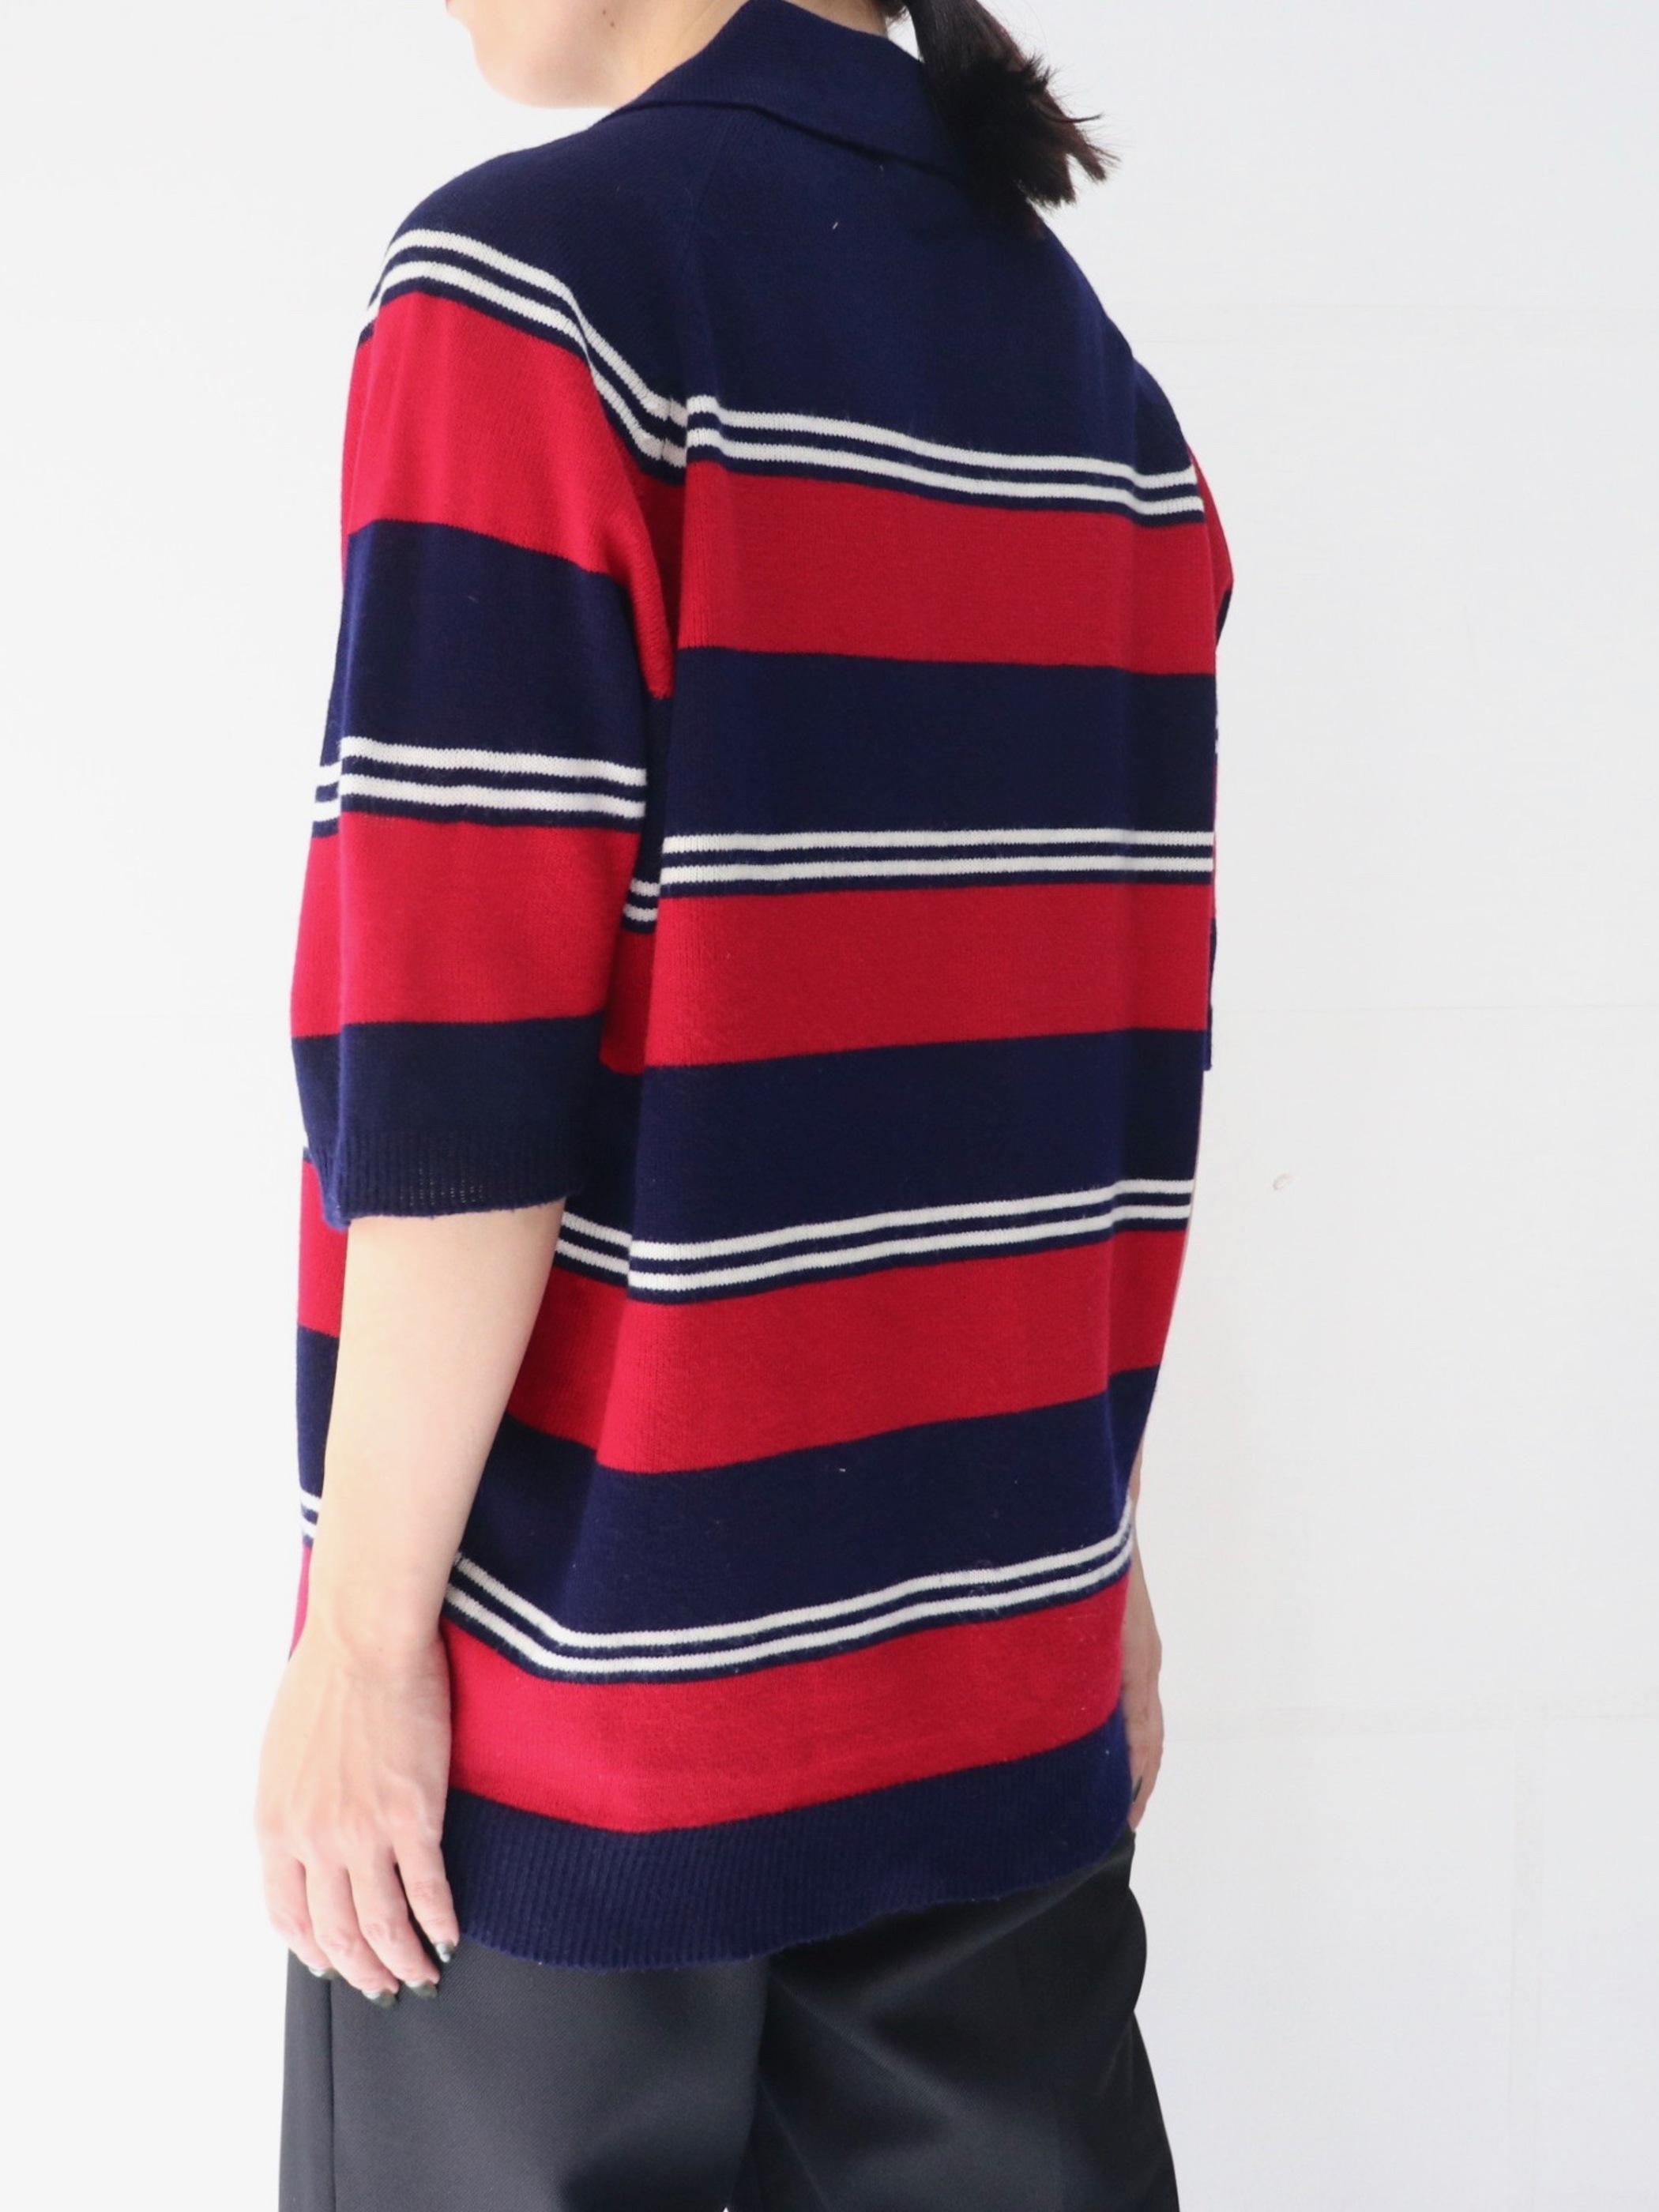 1970s Mulch border pattern knit polo